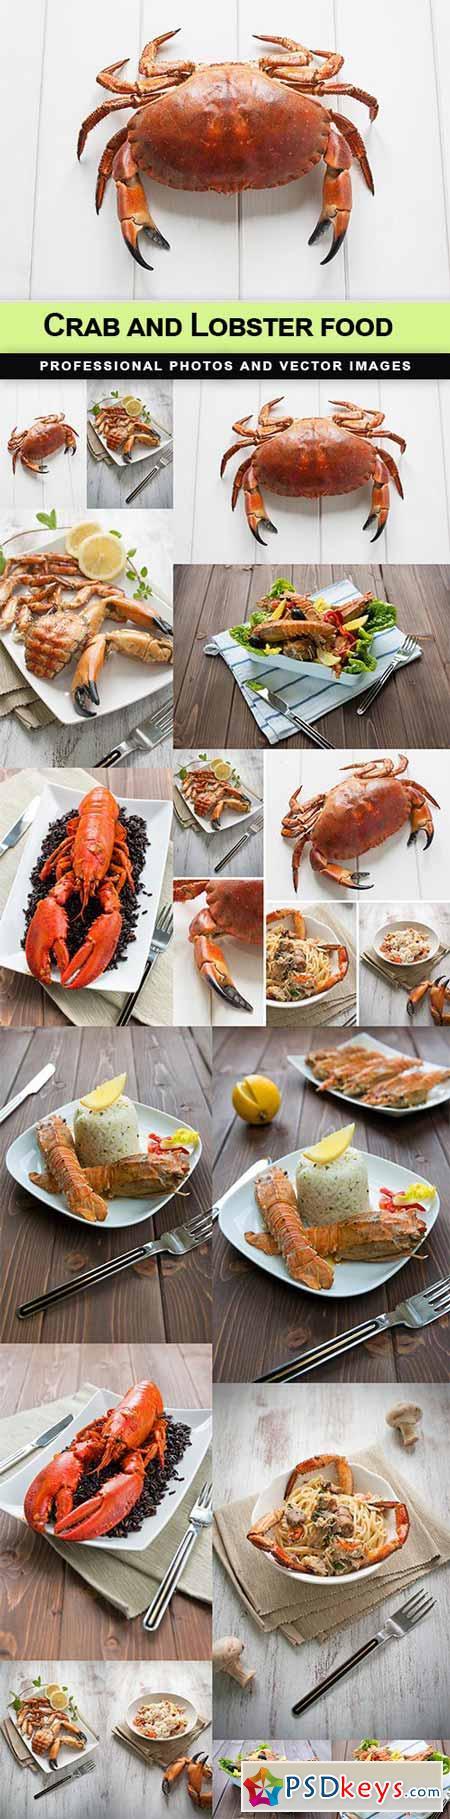 Crab and Lobster food - 15 UHQ JPEG